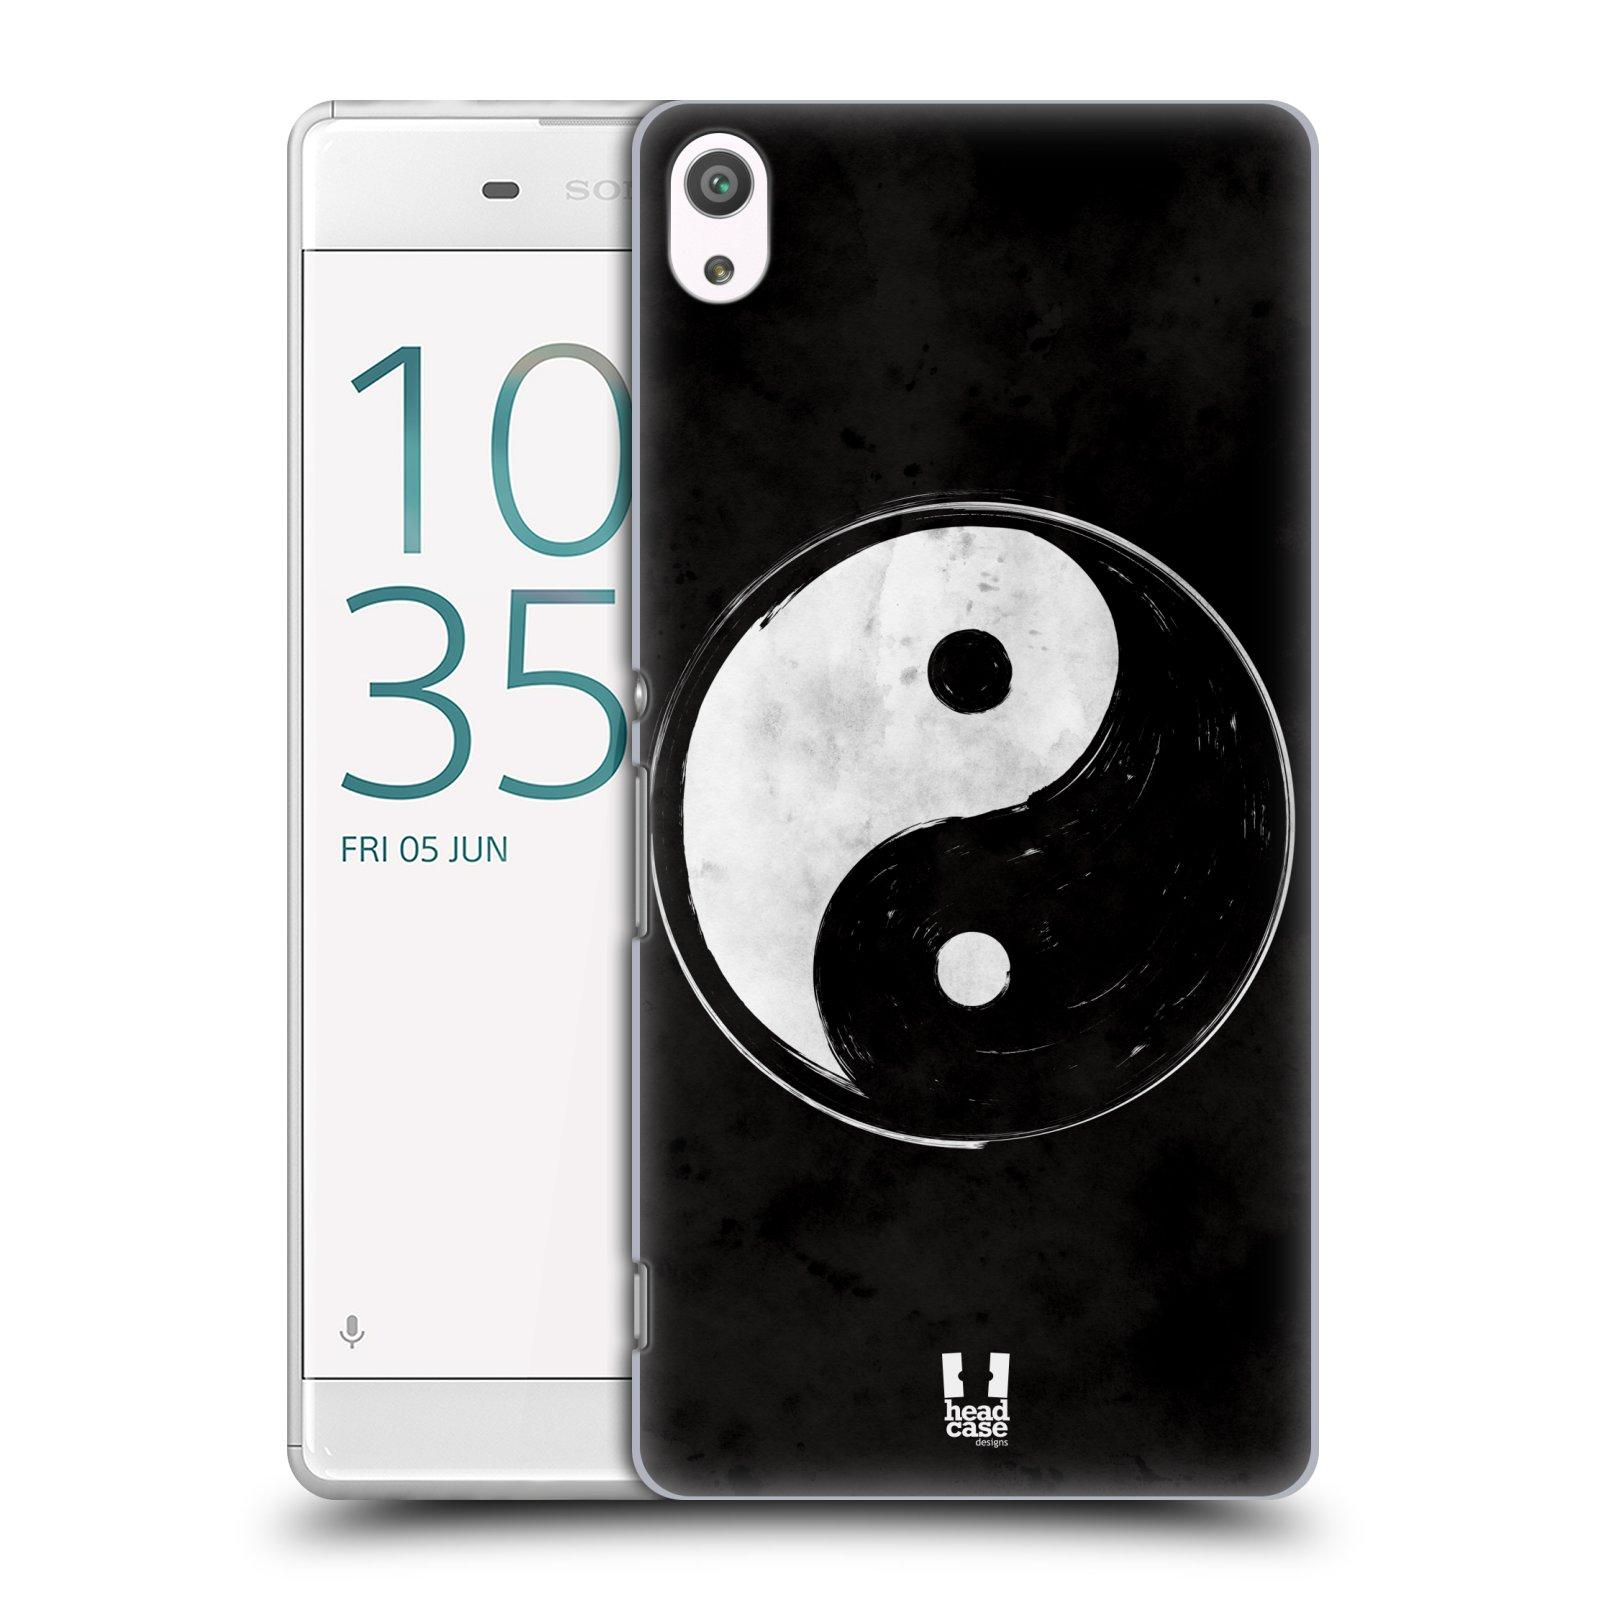 Plastové pouzdro na mobil Sony Xperia XA Ultra HEAD CASE Yin a Yang BW (Plastový kryt či obal na mobilní telefon Sony Xperia XA Ultra F3211)